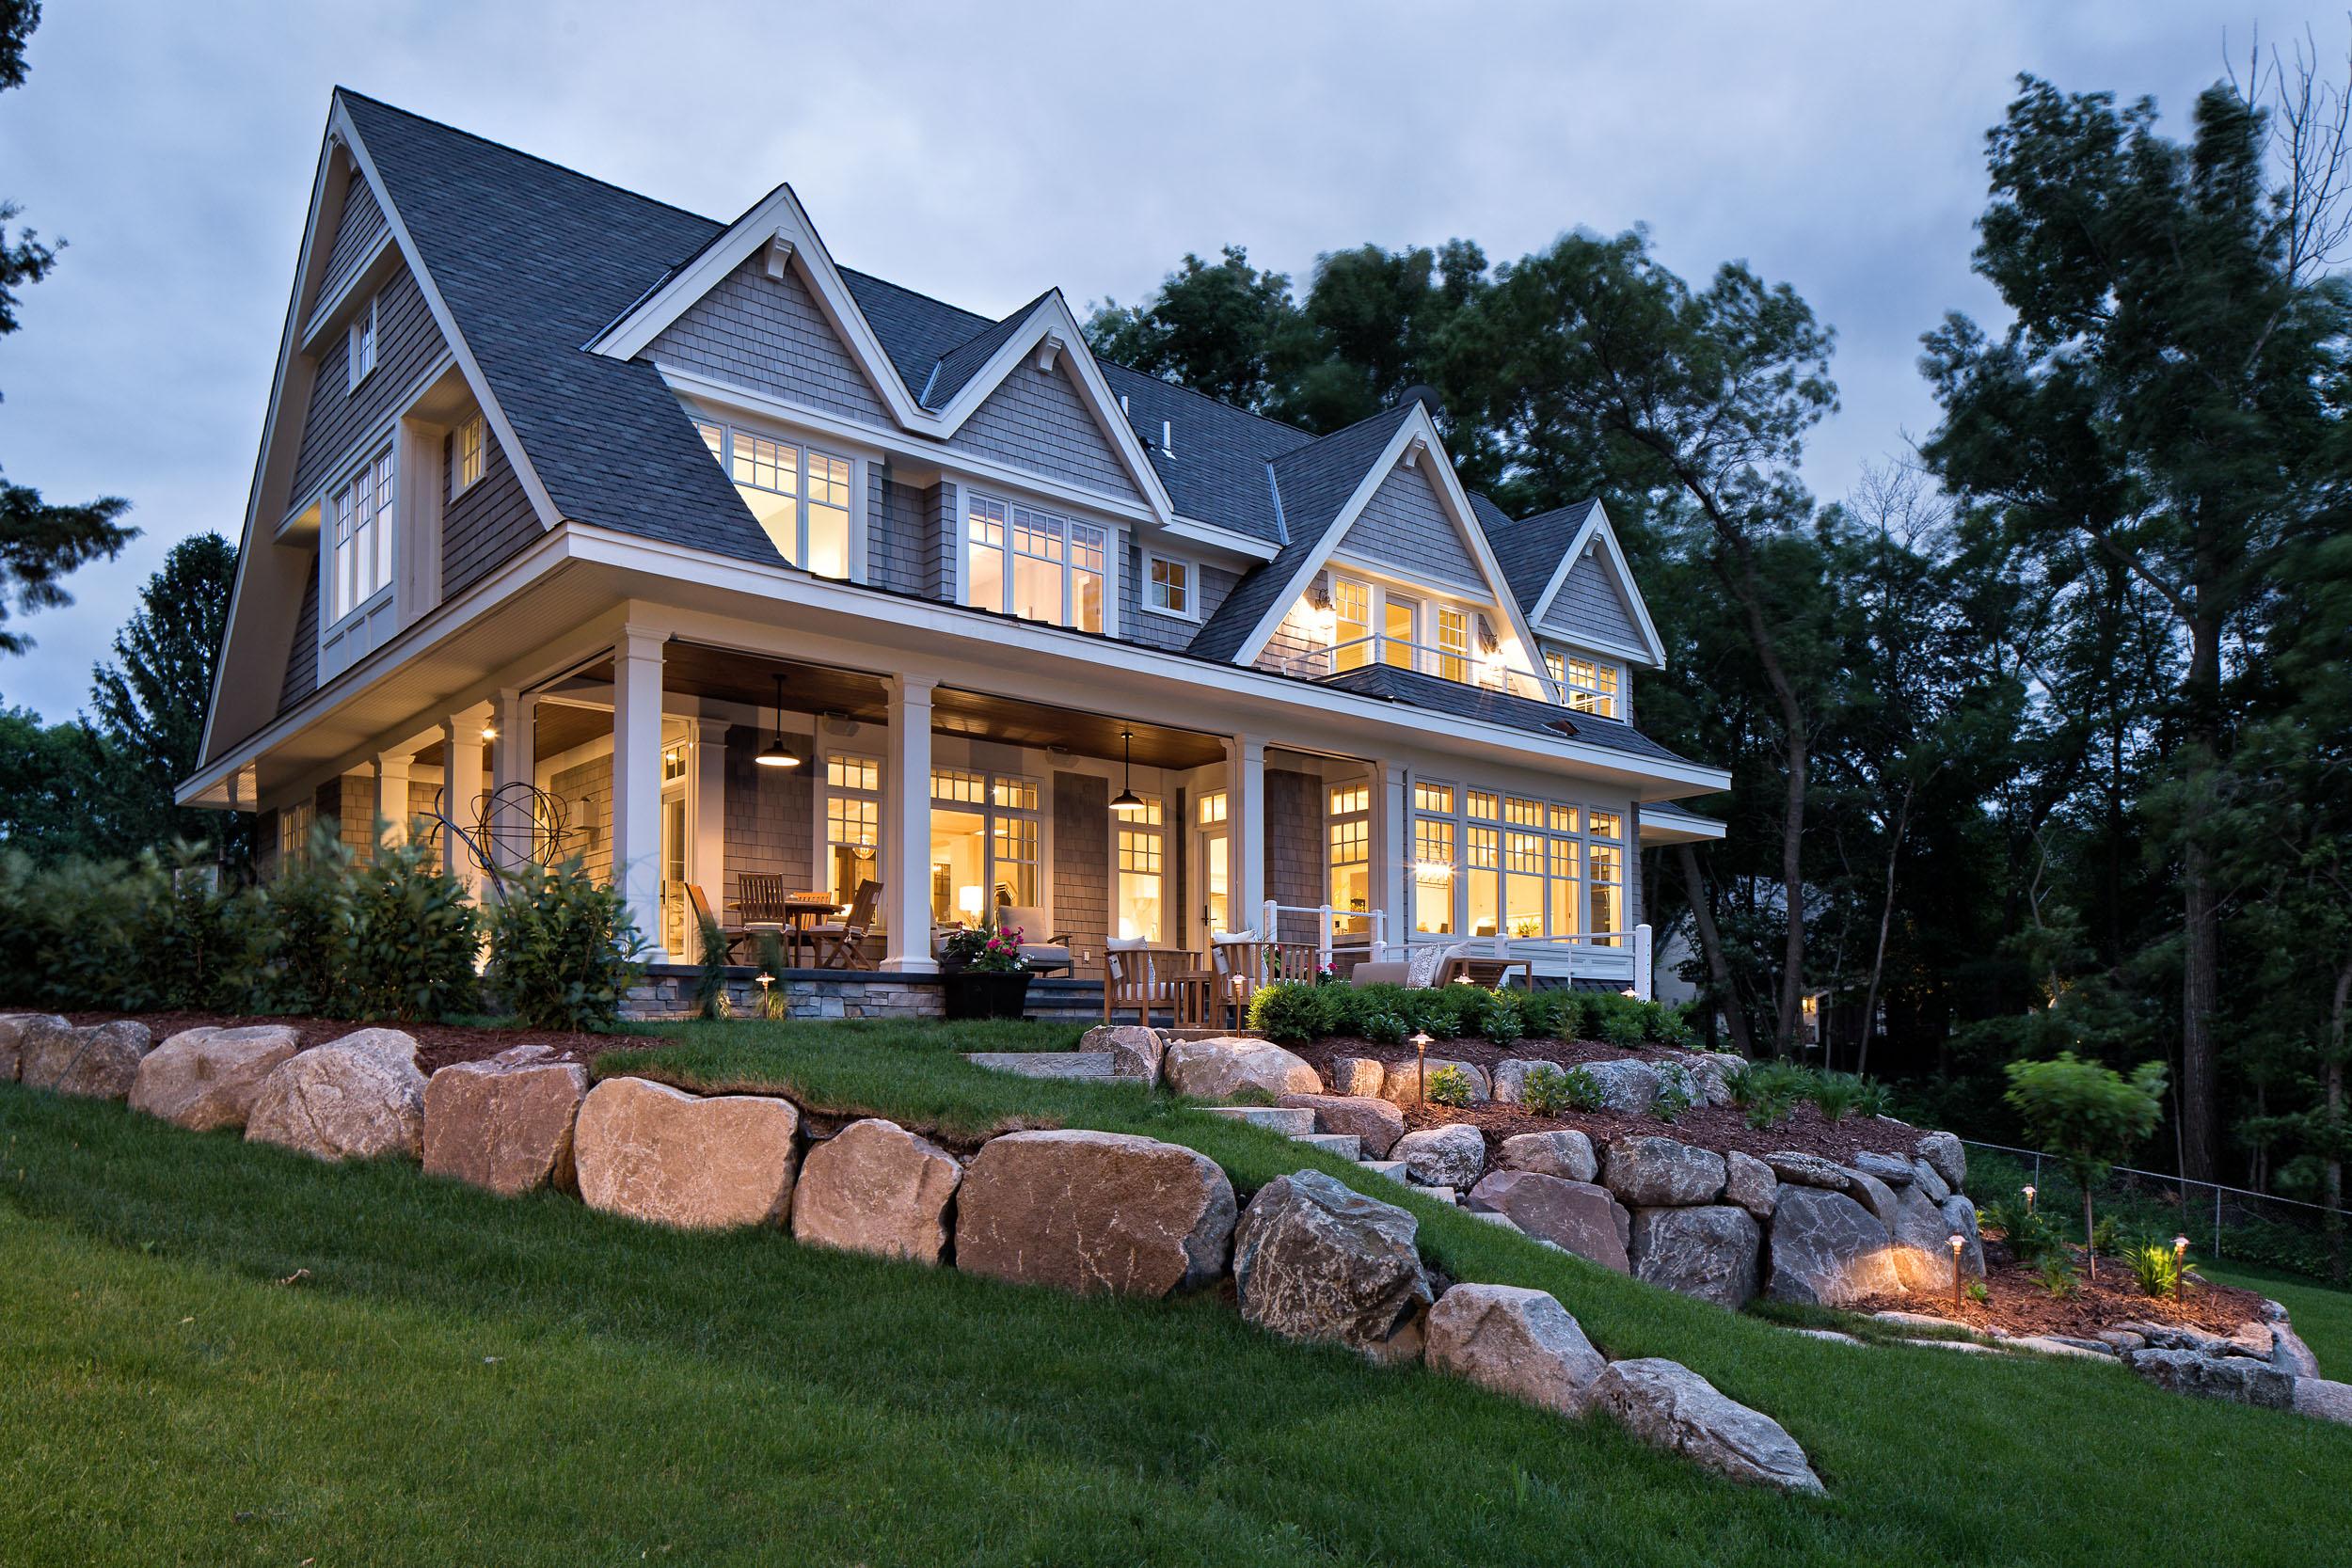 Lake Artisan Home Wrapping Porch